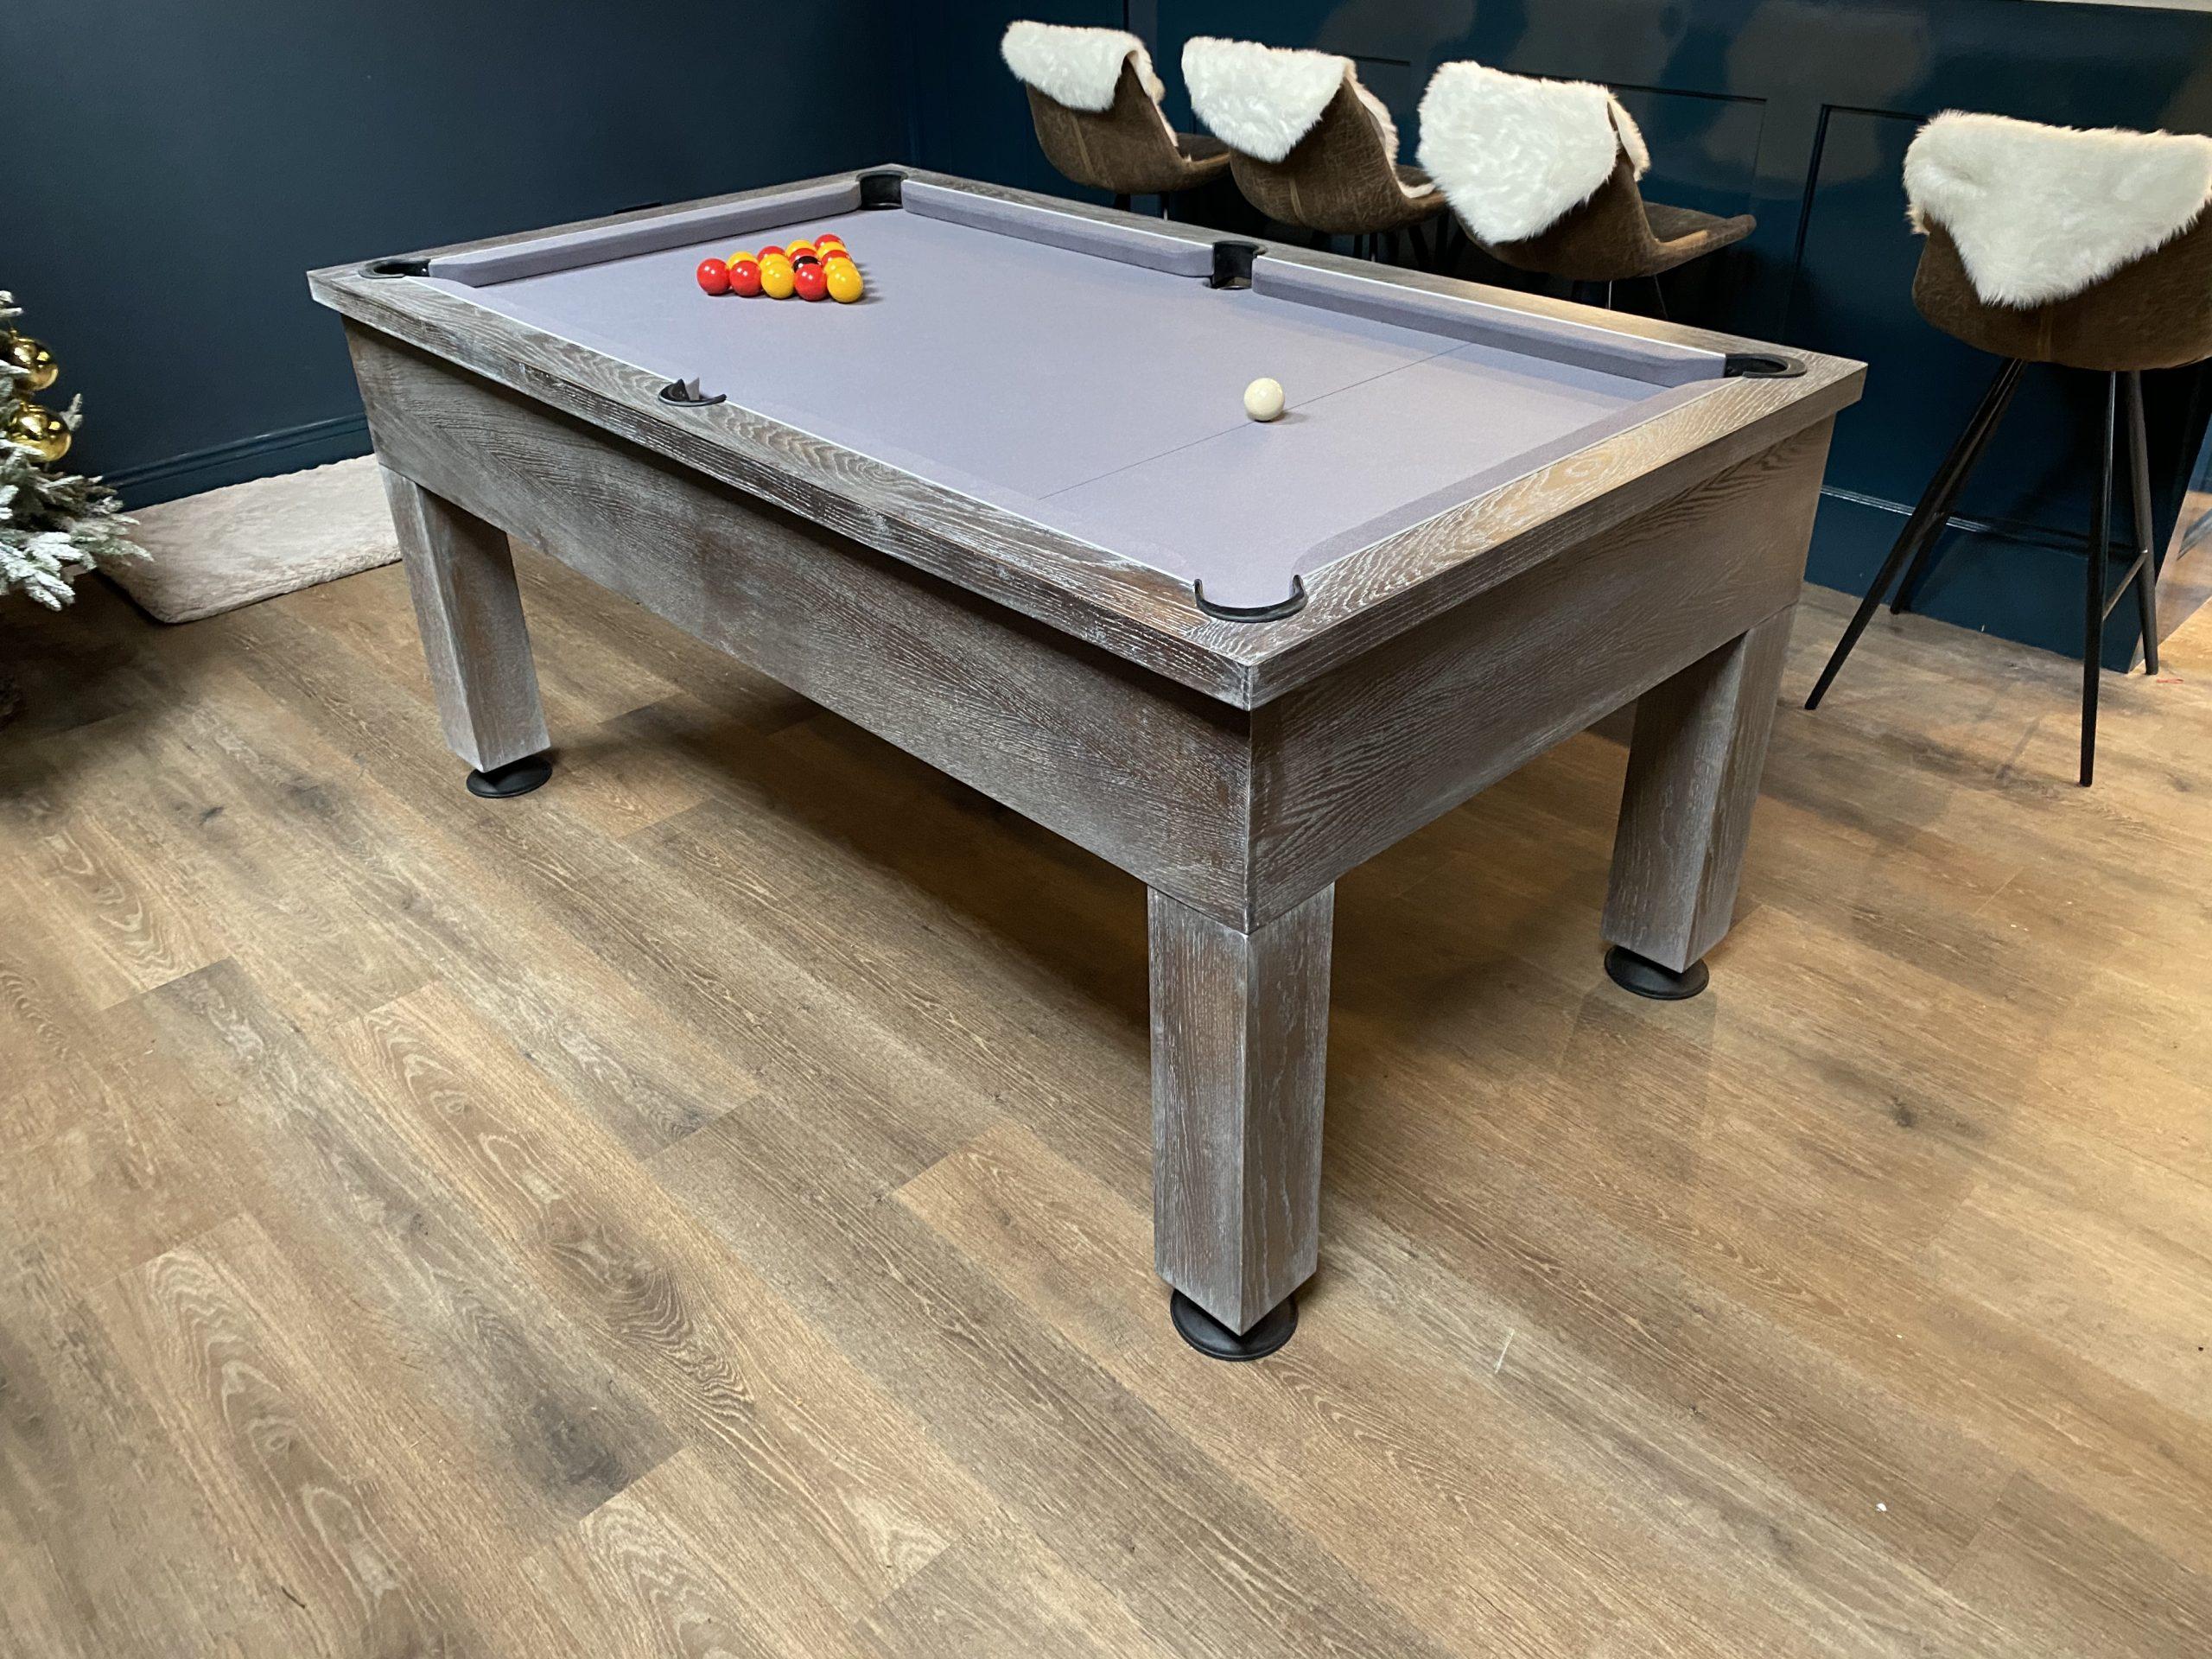 8ft Bespoke Oak Pool Table